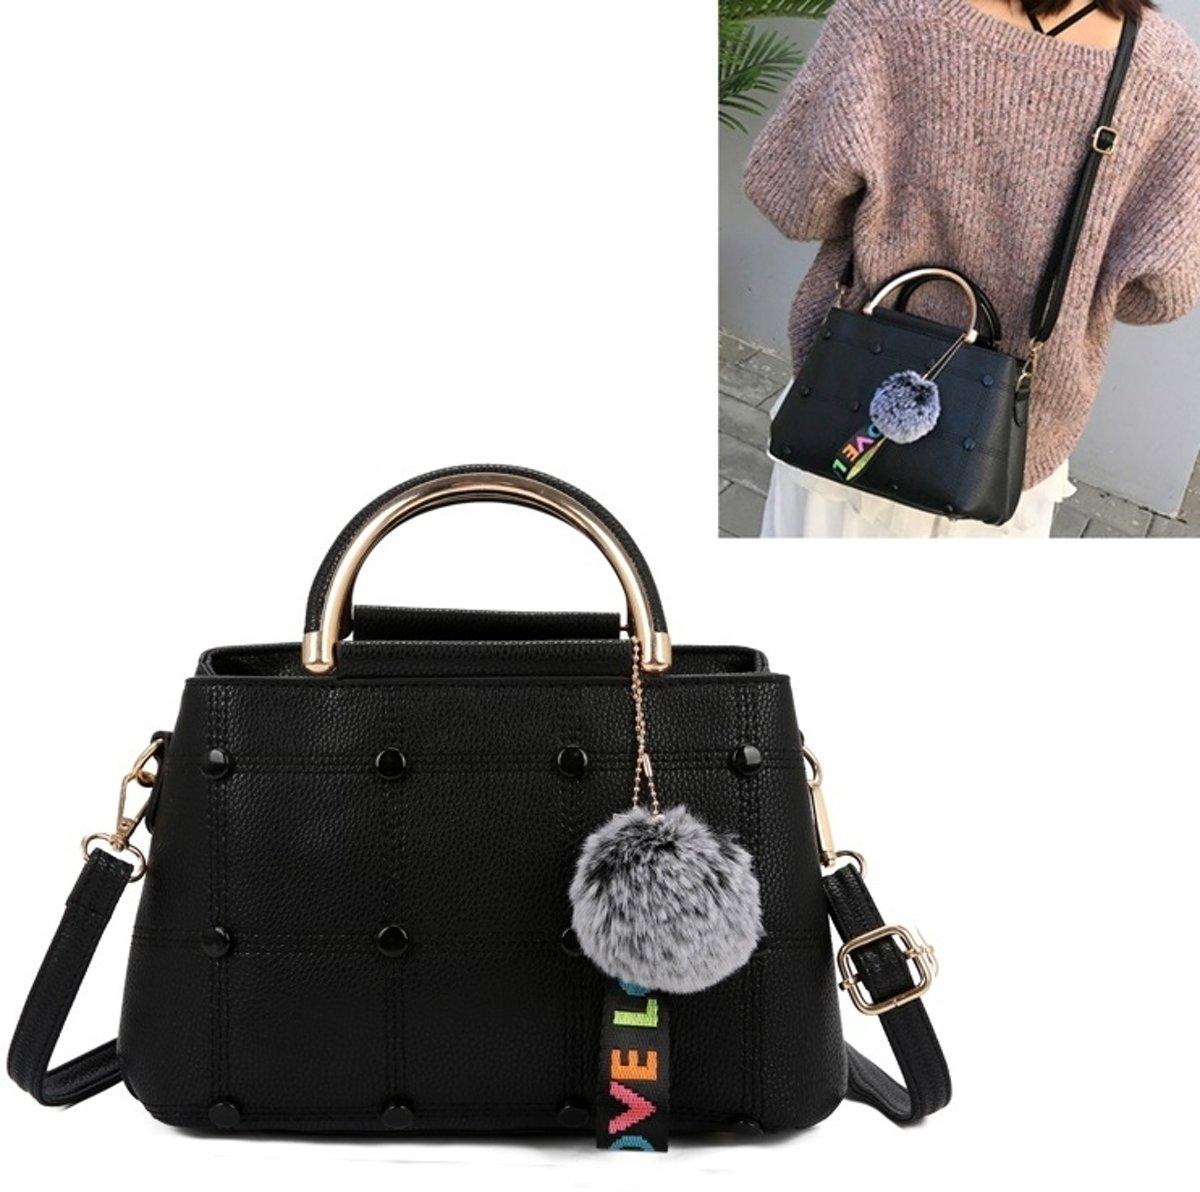 Klein vierkant tas haarbal hanger Casual enkele schouders tas dames handtas messengertas (zwart)